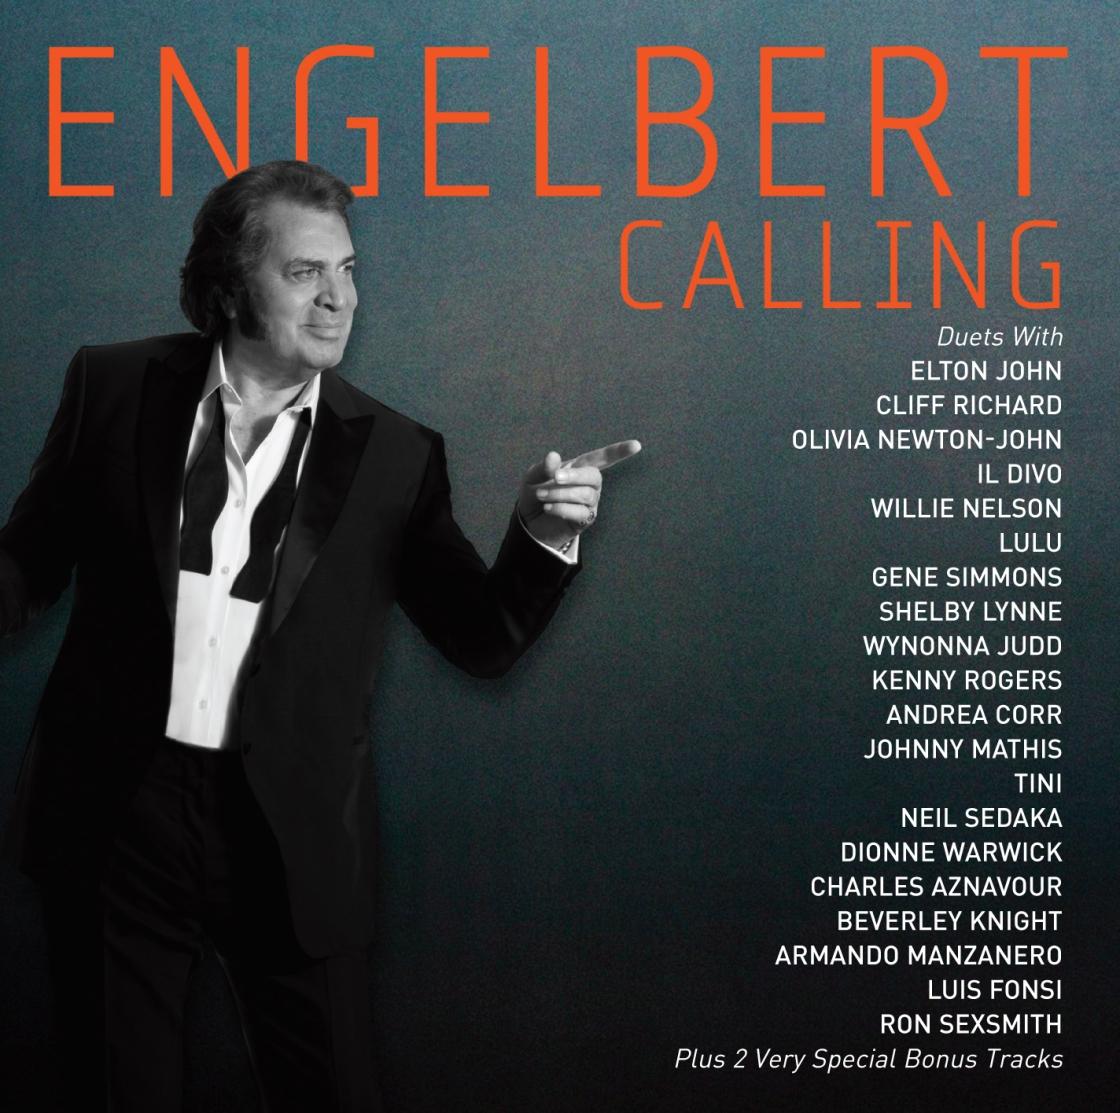 Pictured above is the album cover of 'Engelbert Calling' by Engelbert Humperdinck, released in 2014 on Butler Records